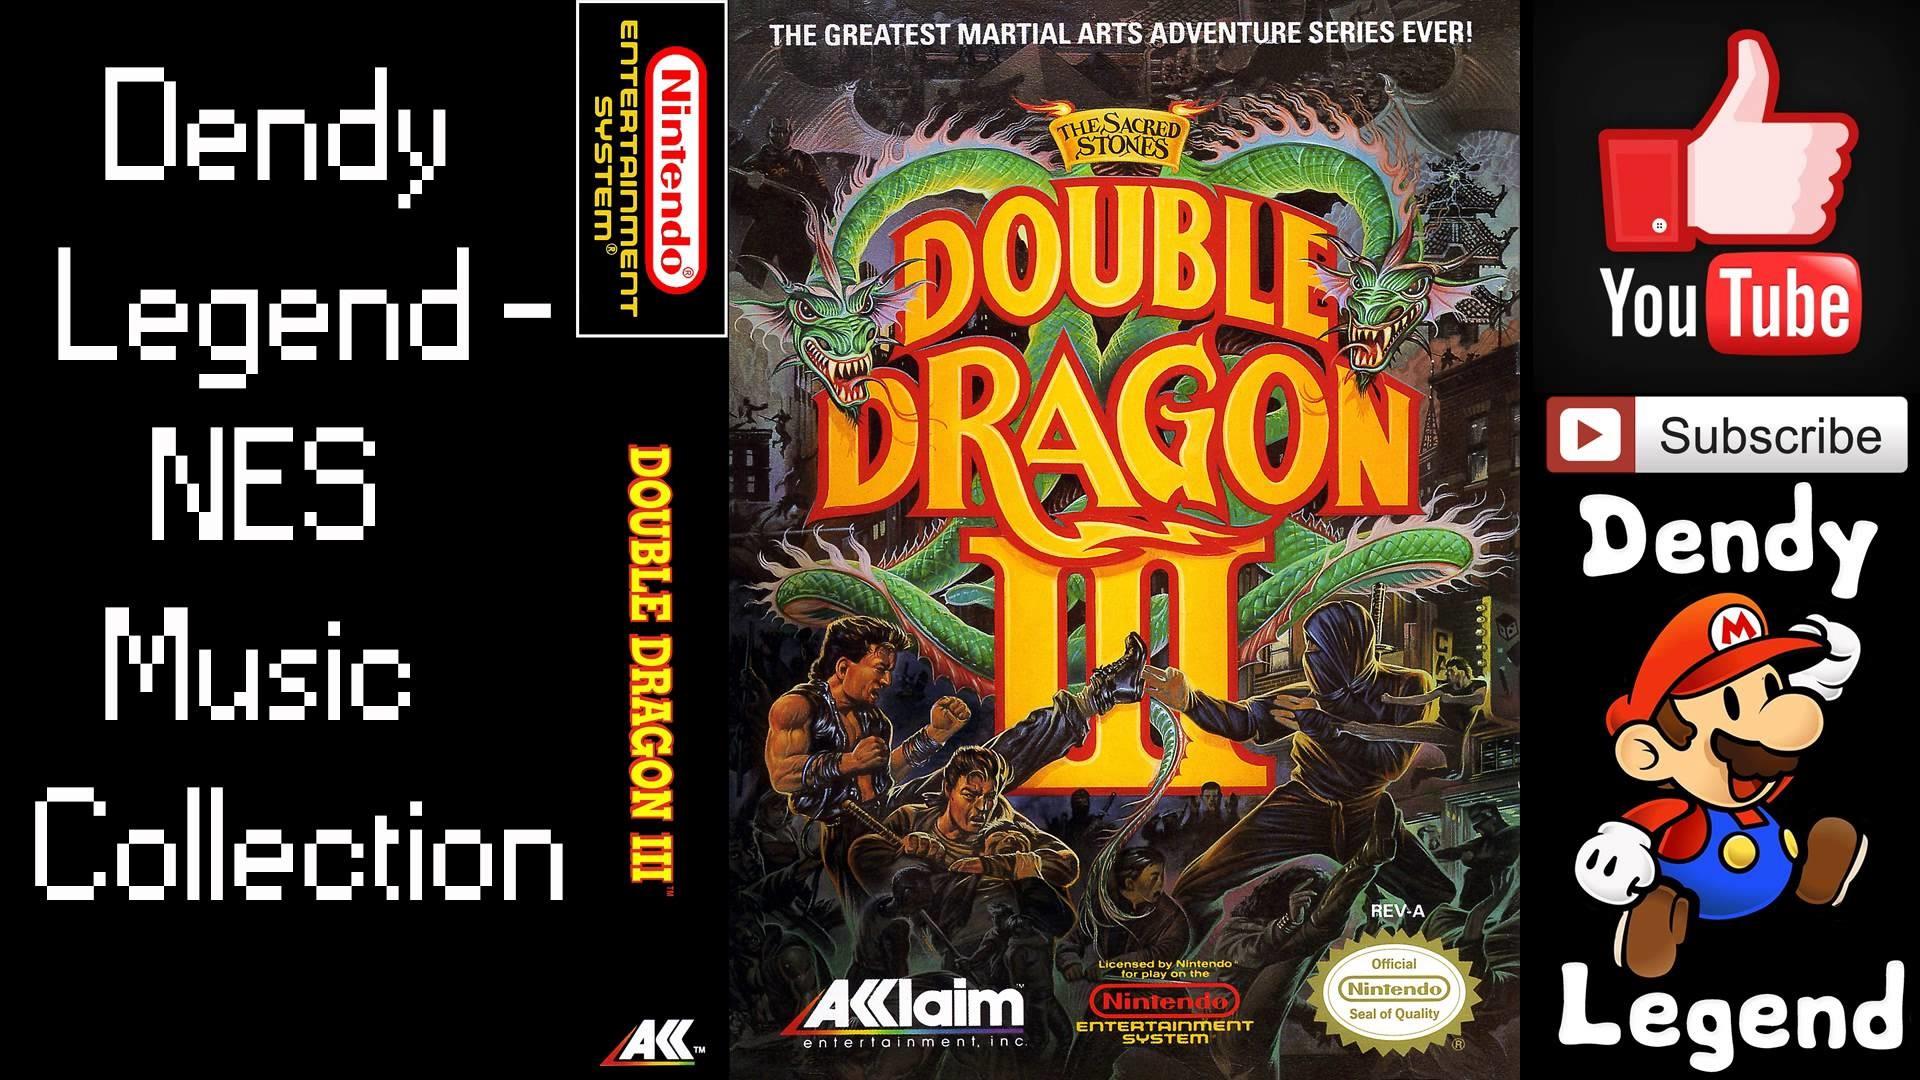 Res: 1920x1080, Double Dragon III - The Sacred Stones - NES - Gameplay screenshot